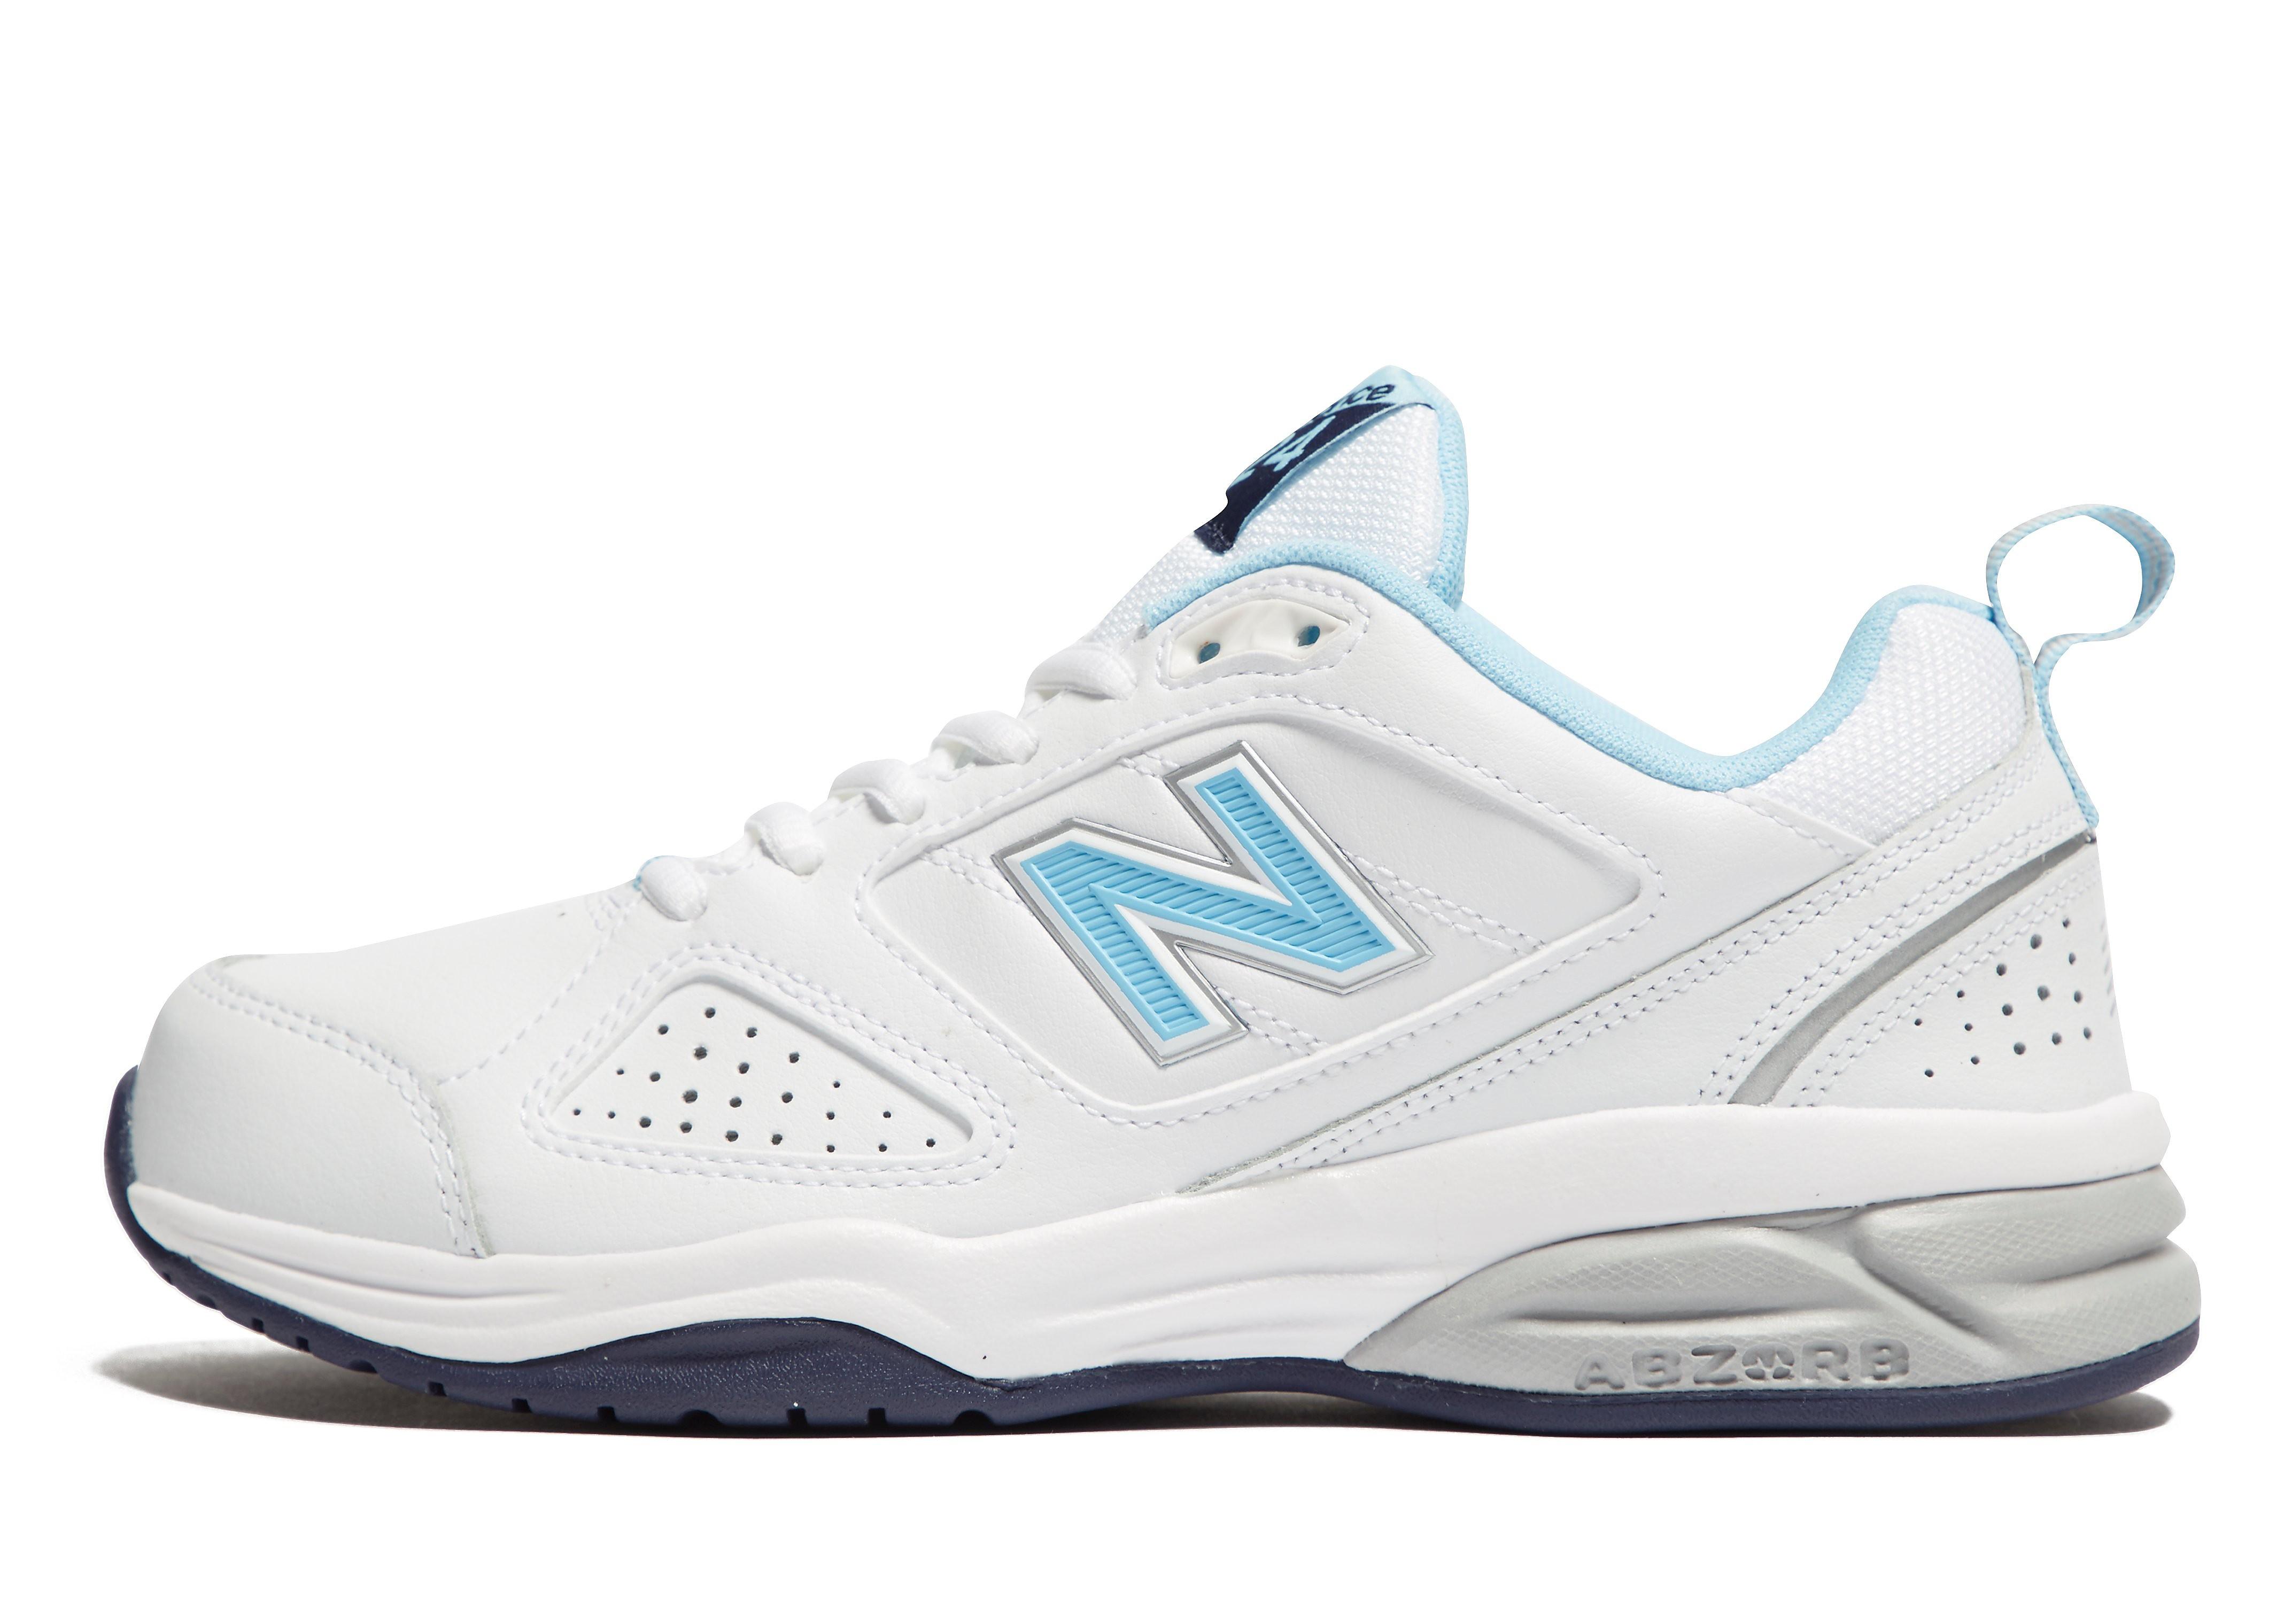 New Balance 624v4 Fitness Shoes Women's